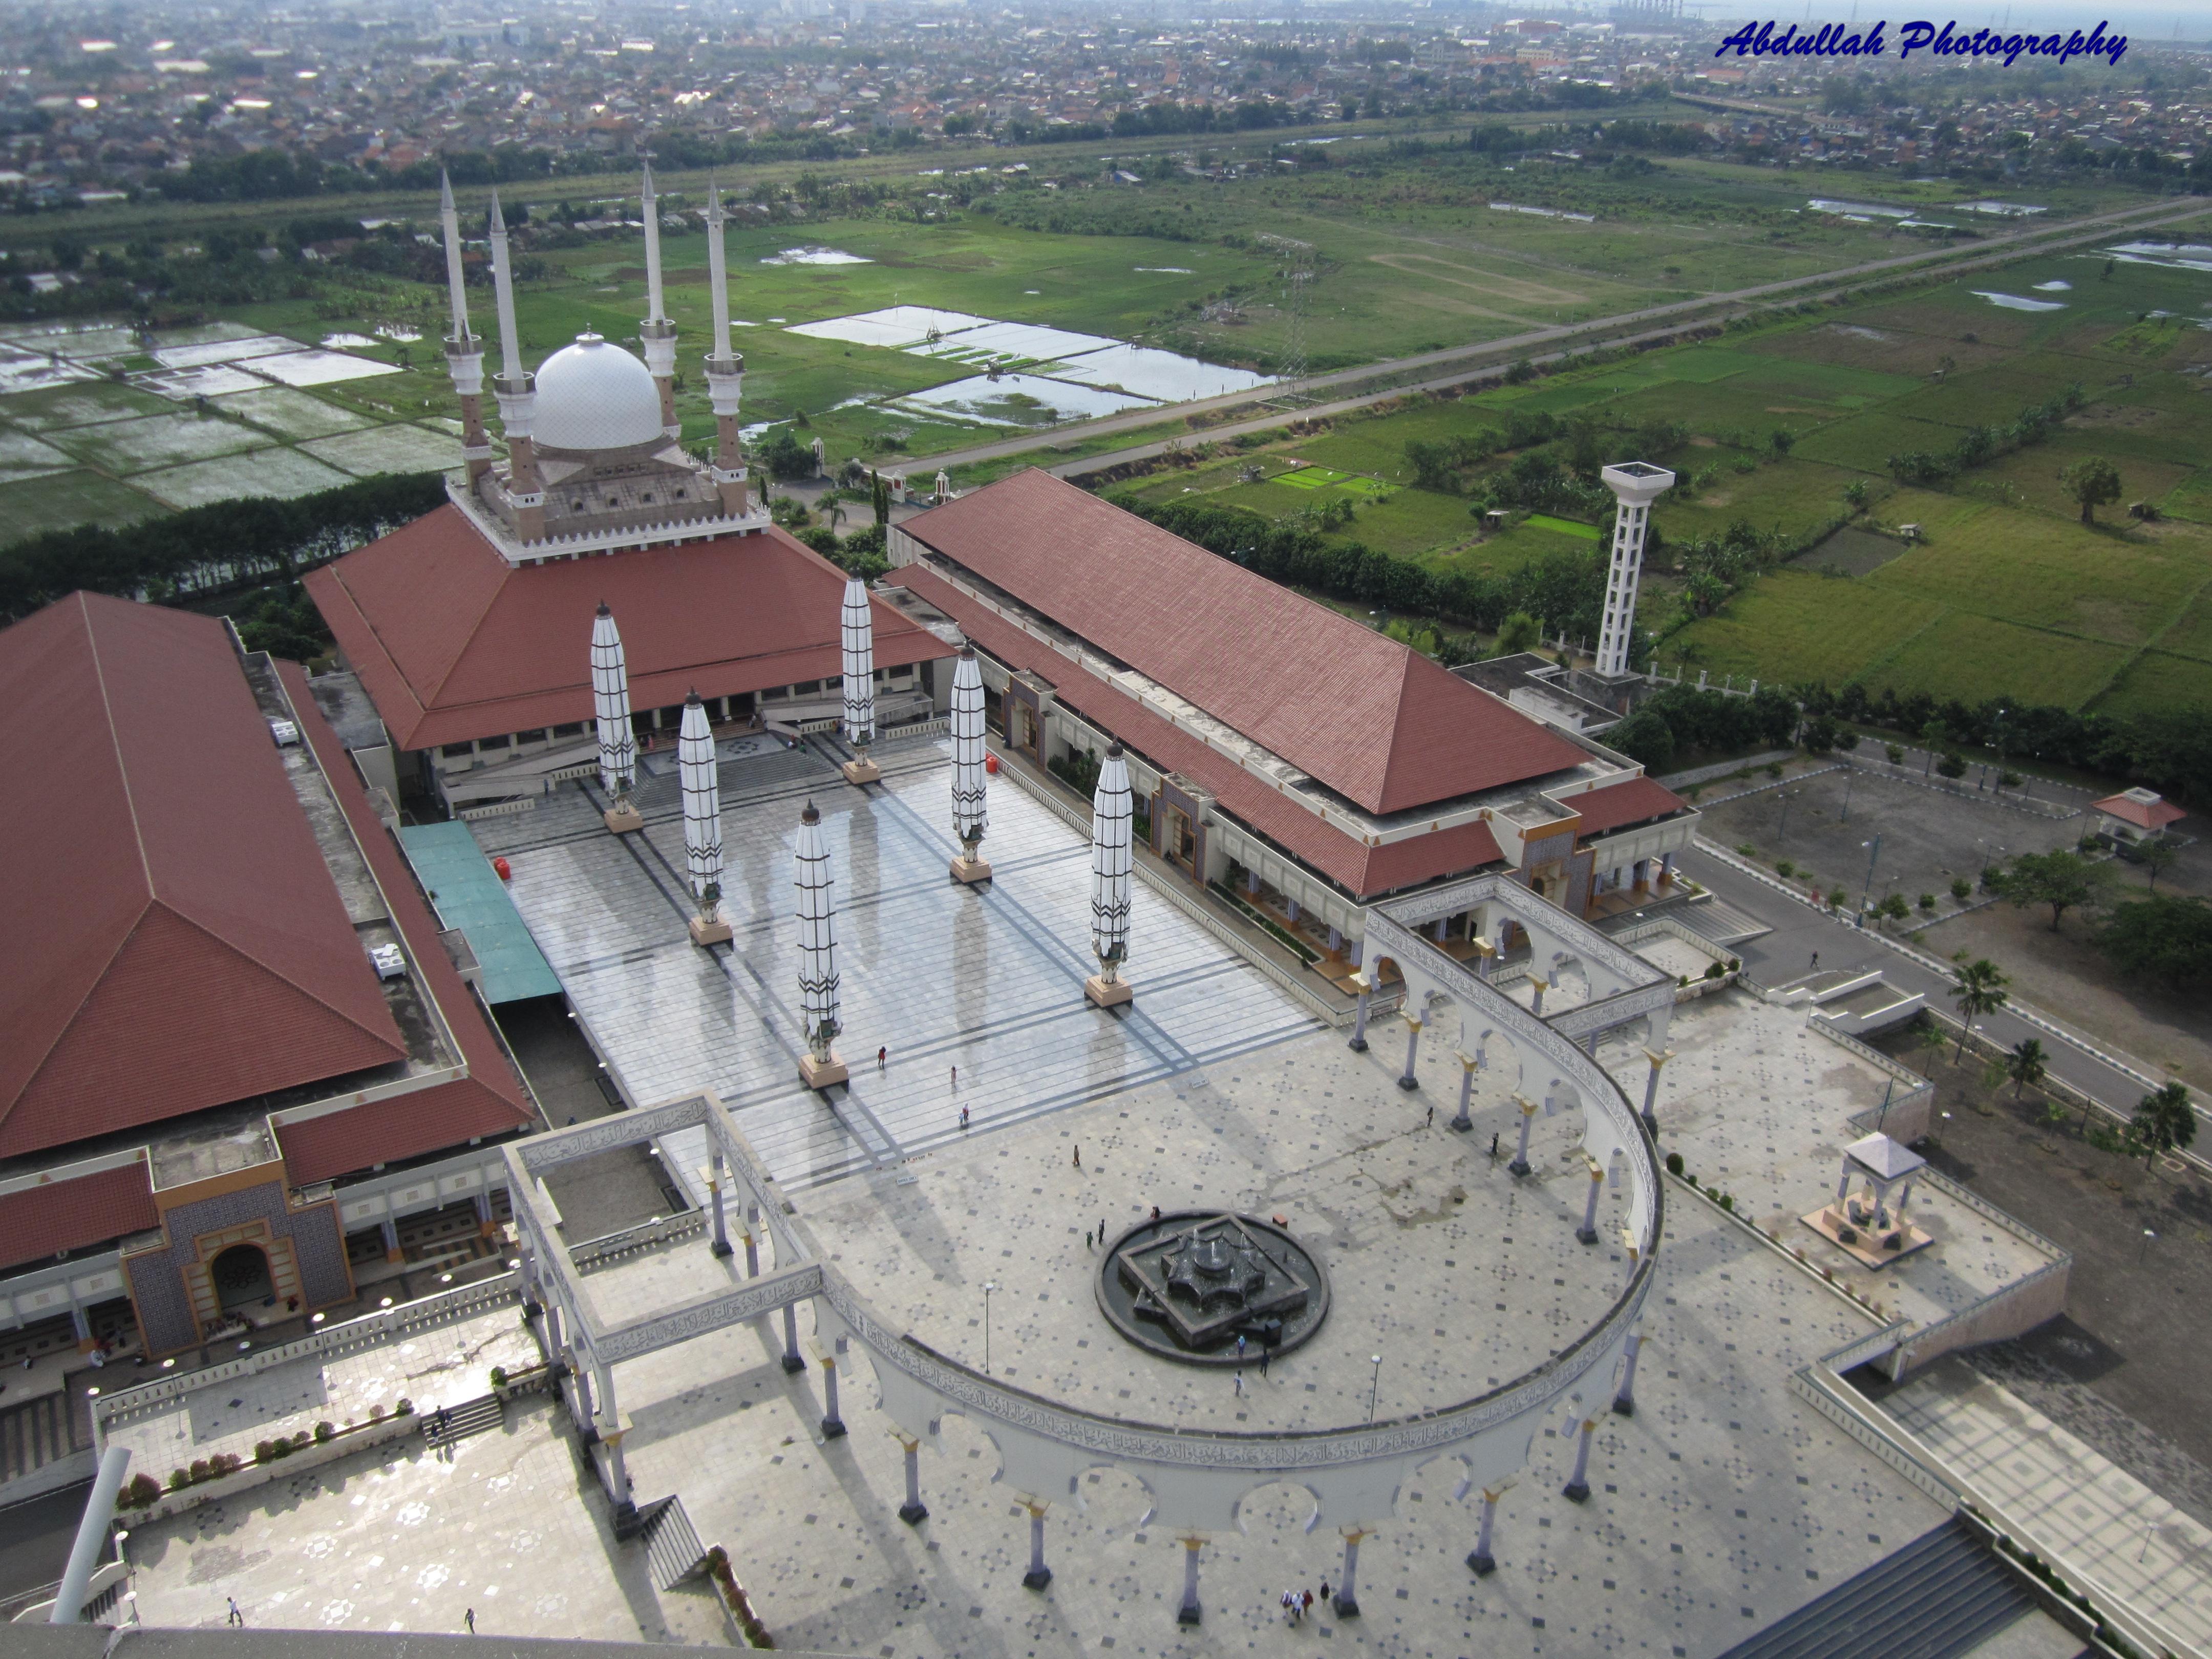 August 2013 Abdullah Hatta Selamat Datang Masjid Agung Jawa Tengah